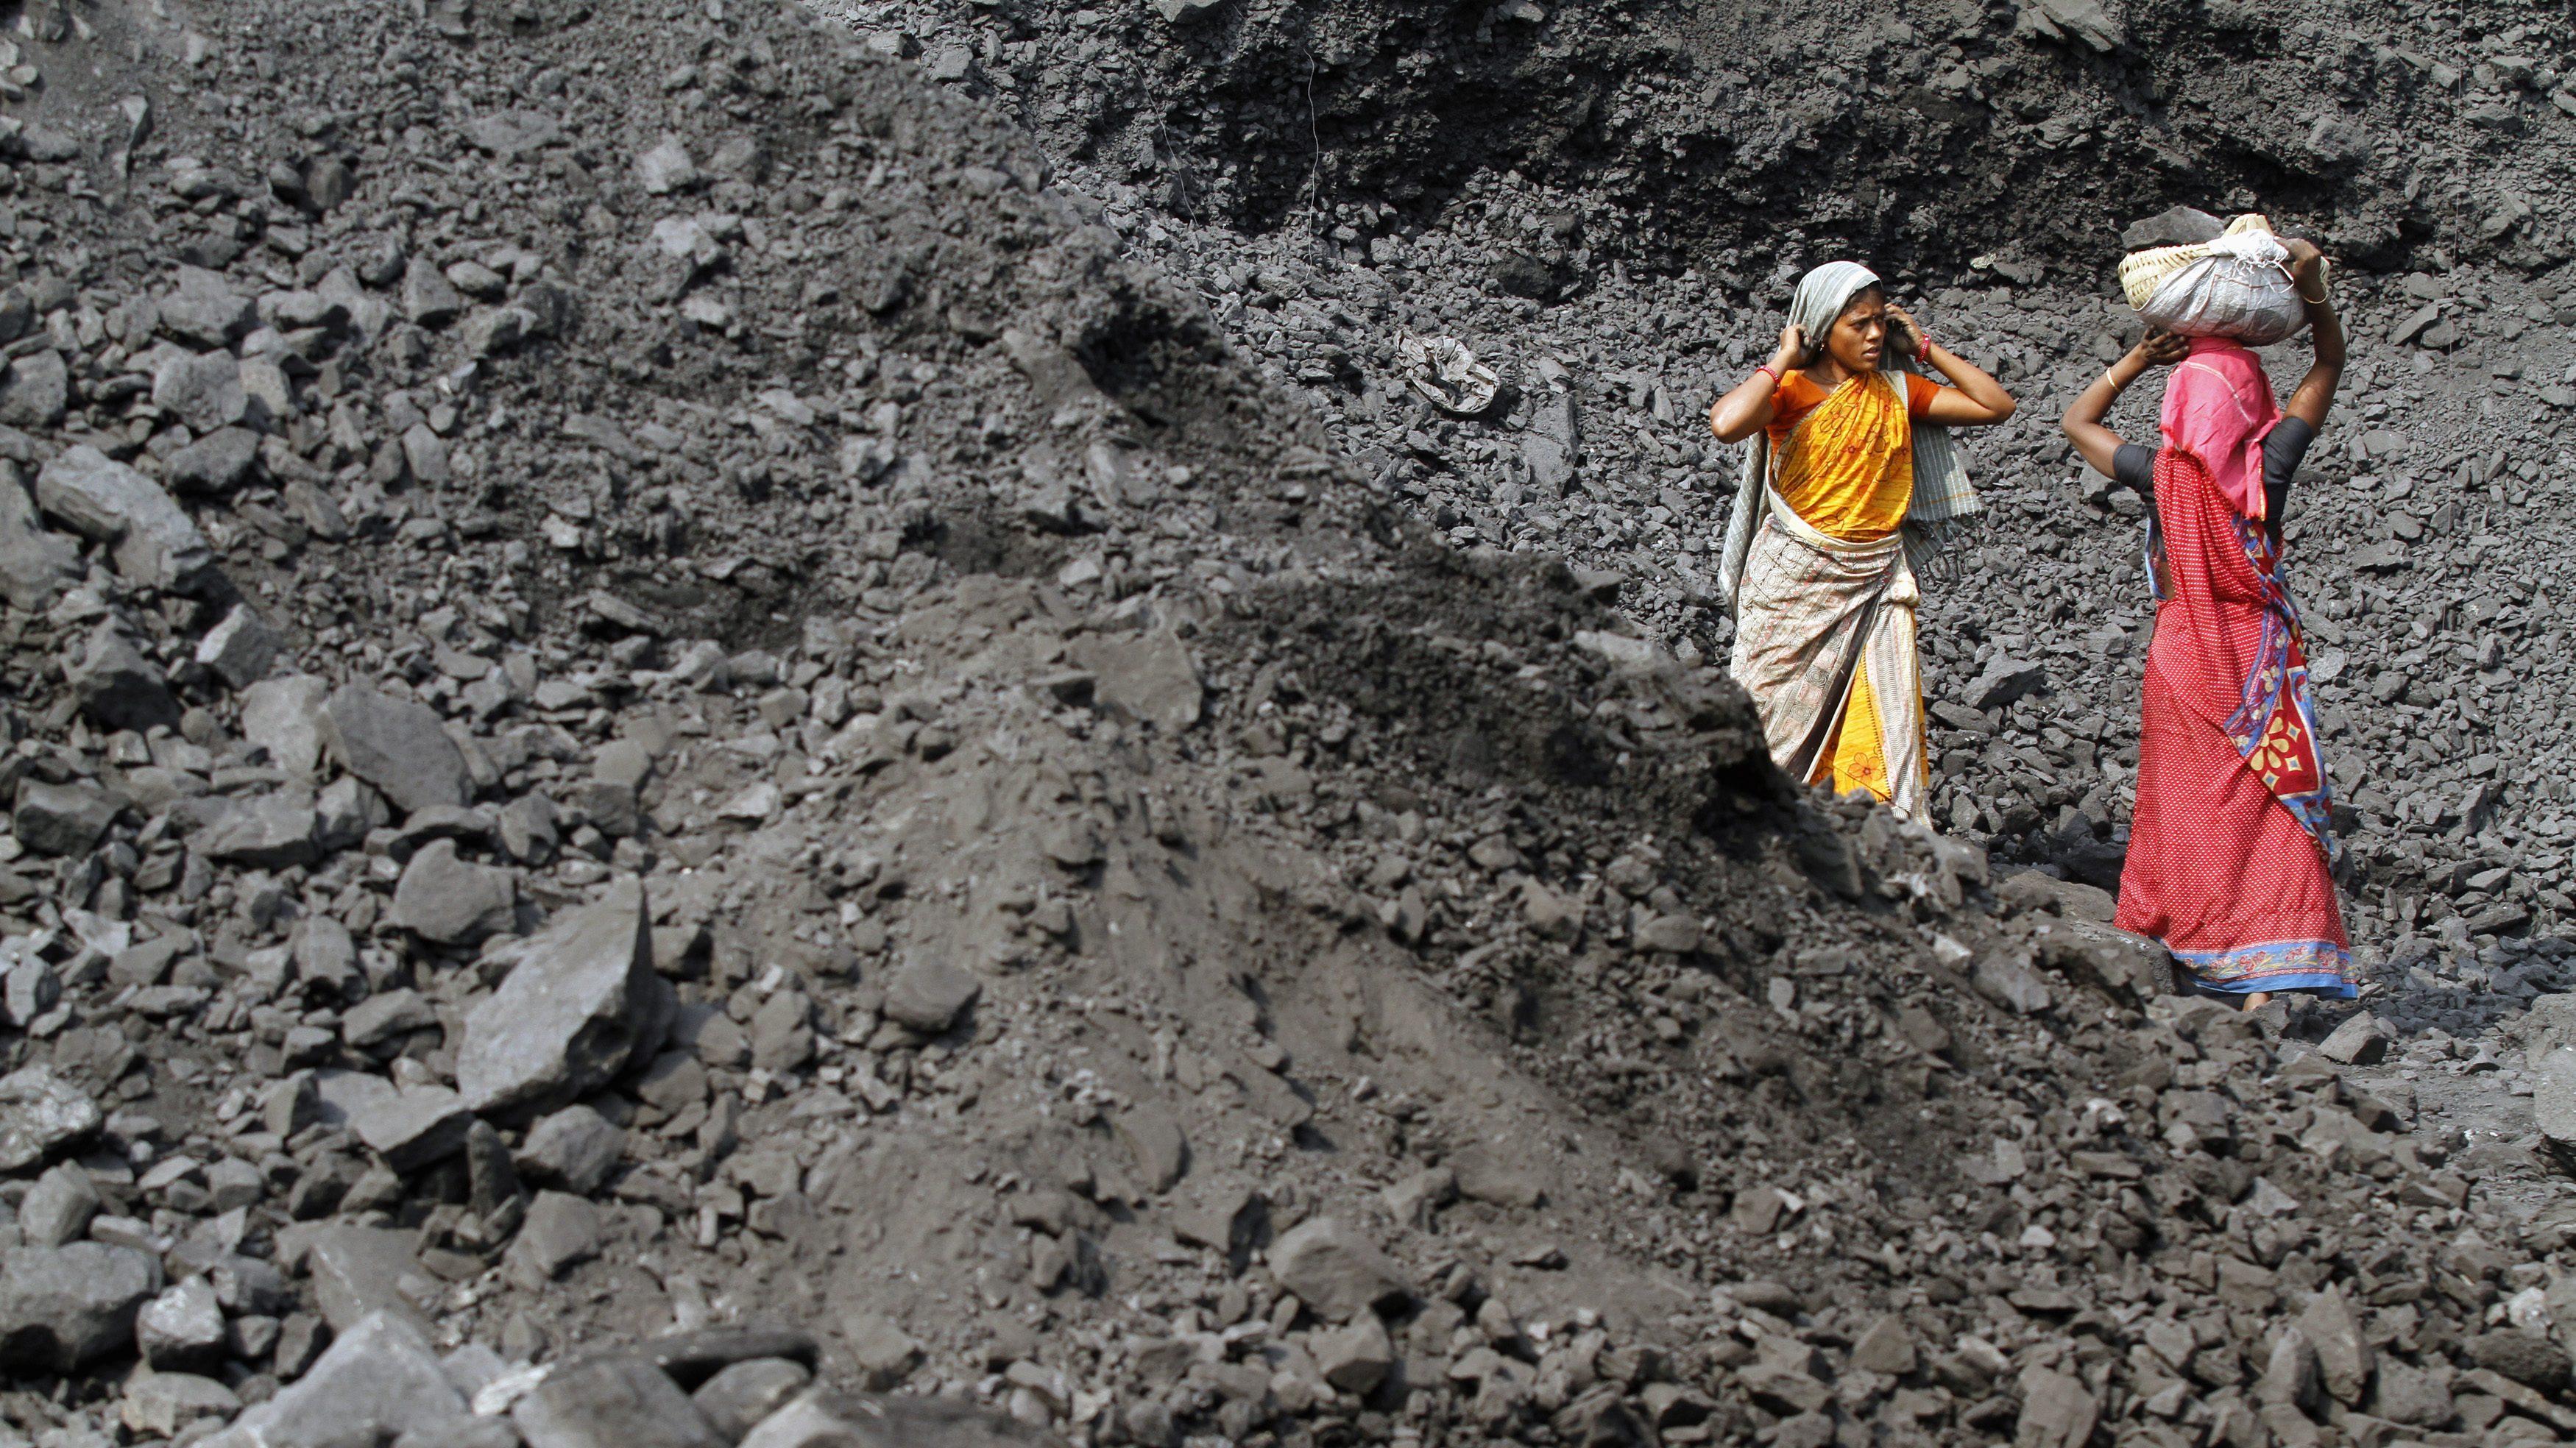 India's new coal FDI policy may not attract Glencore, BHP